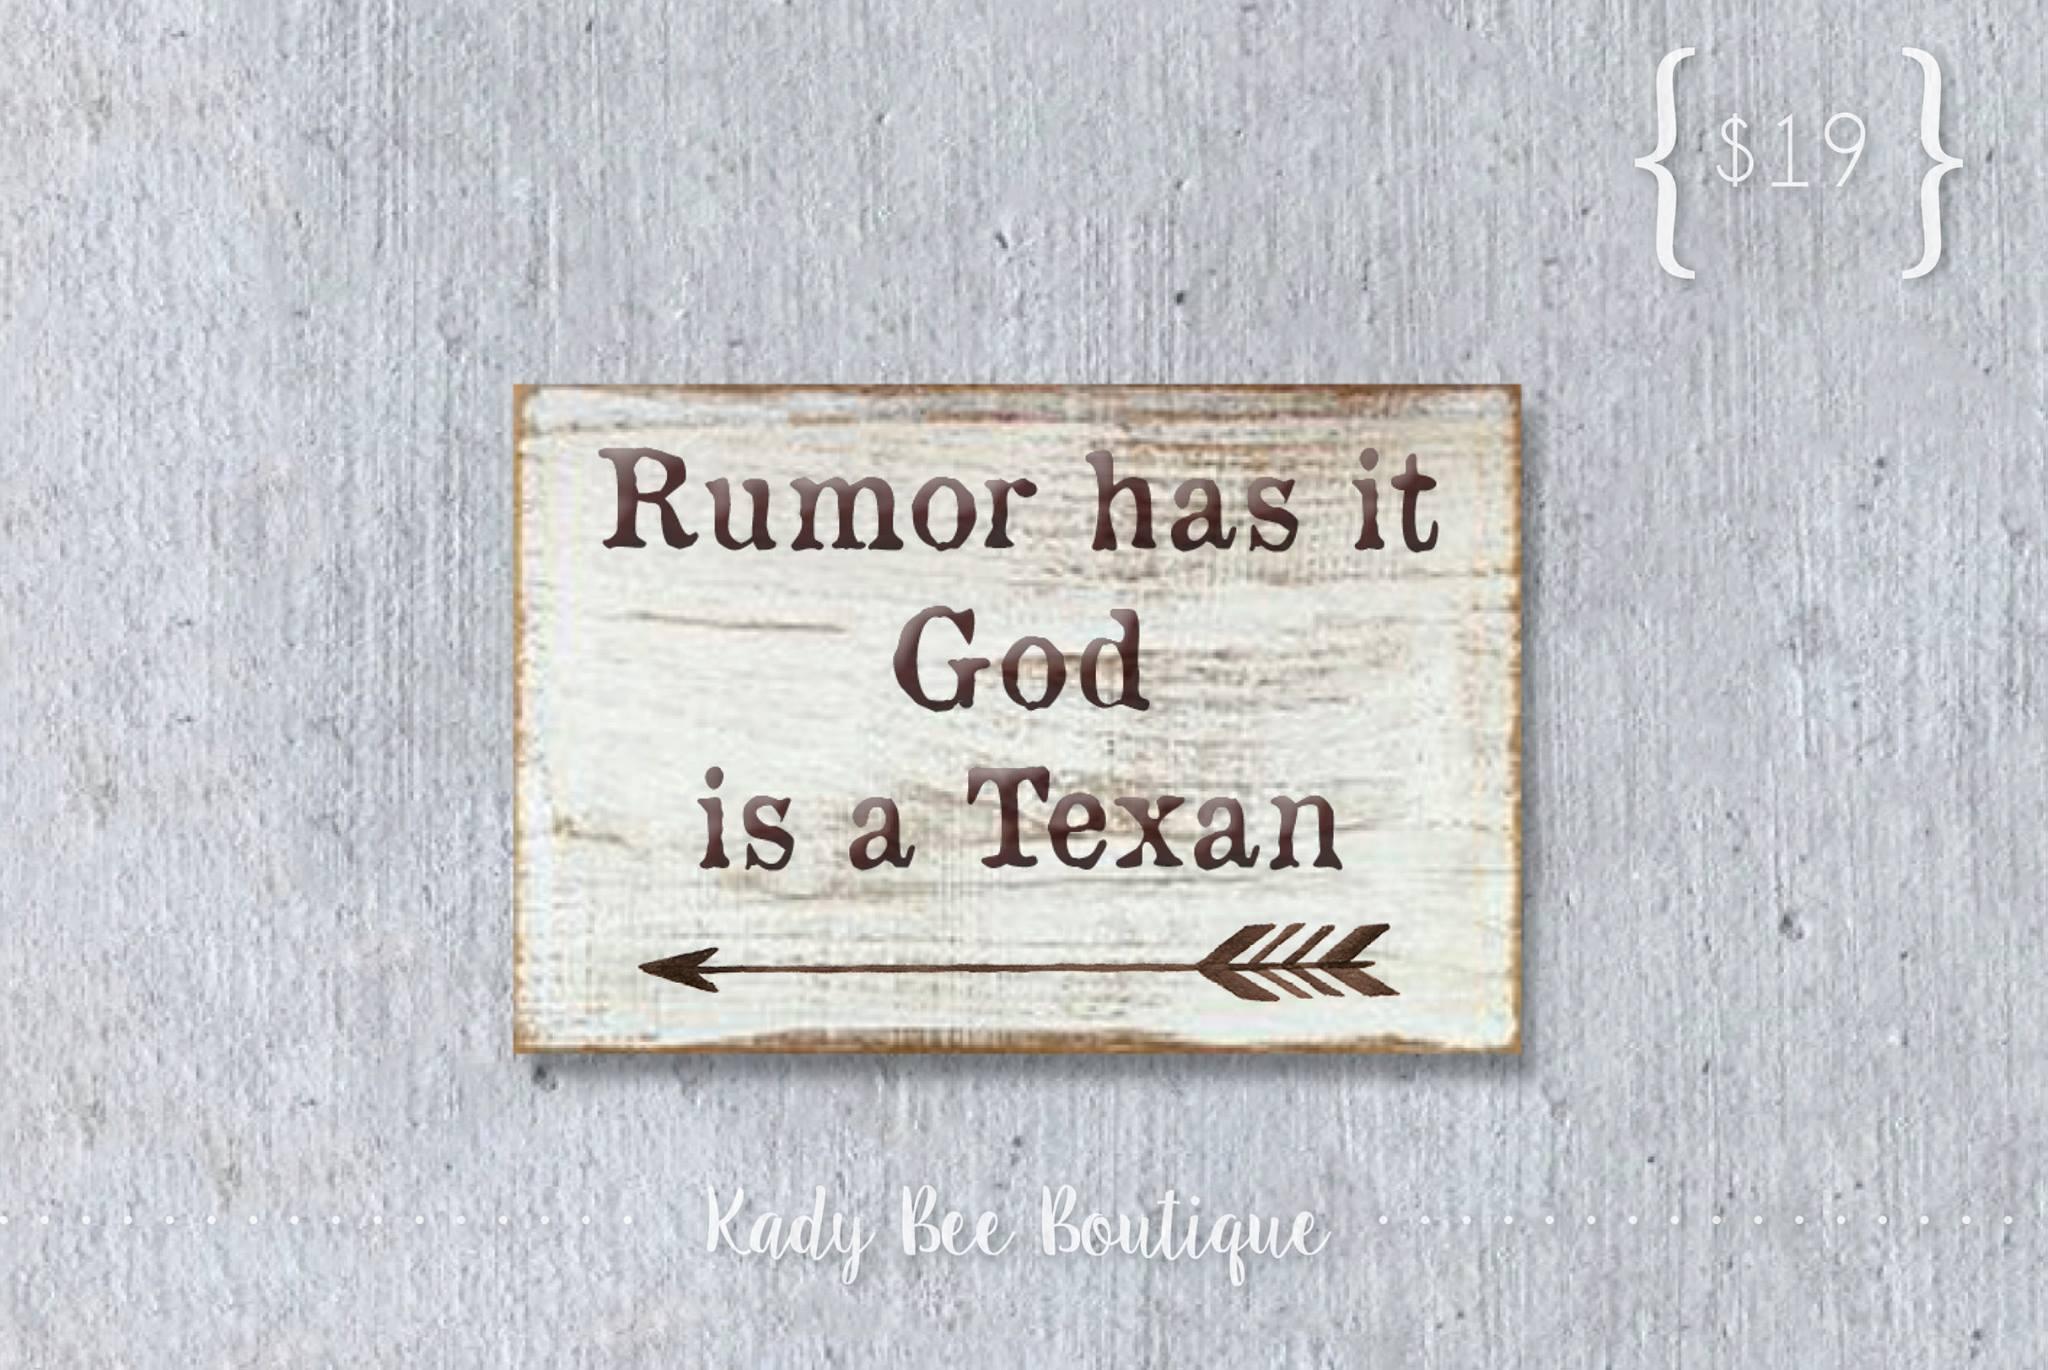 Rumor has it, God is a Texan